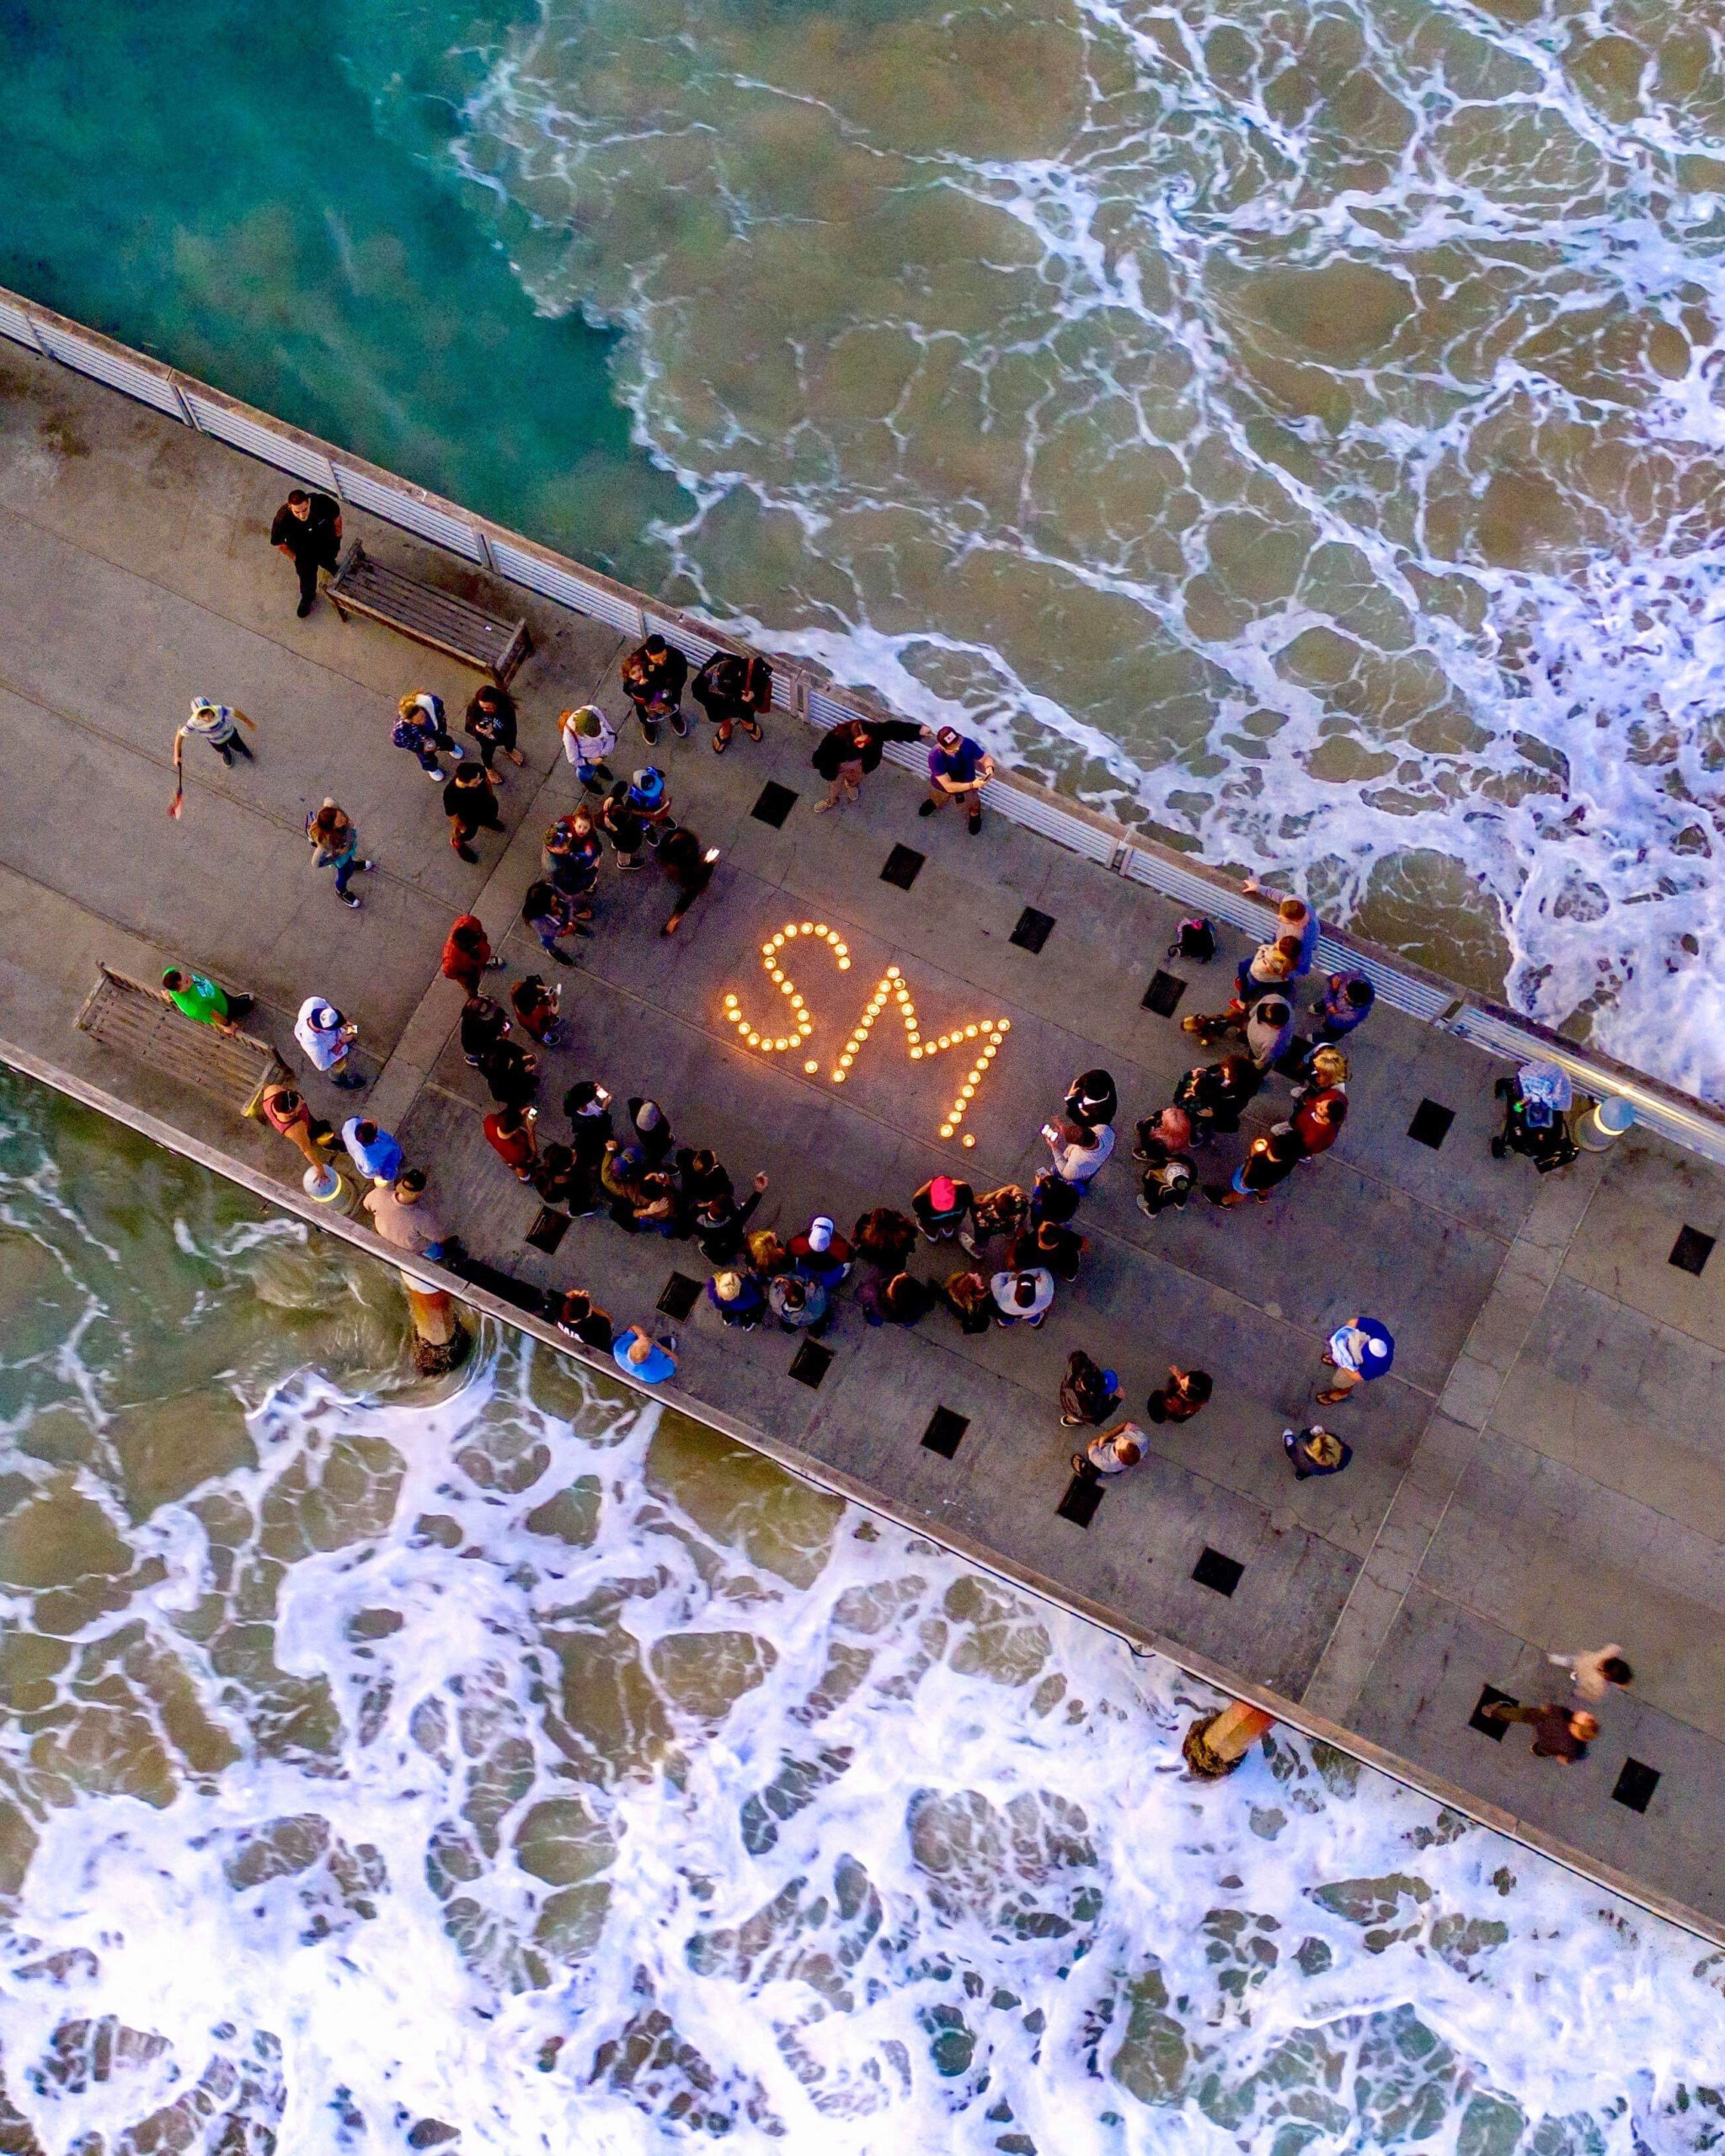 beachside candlelight vigil